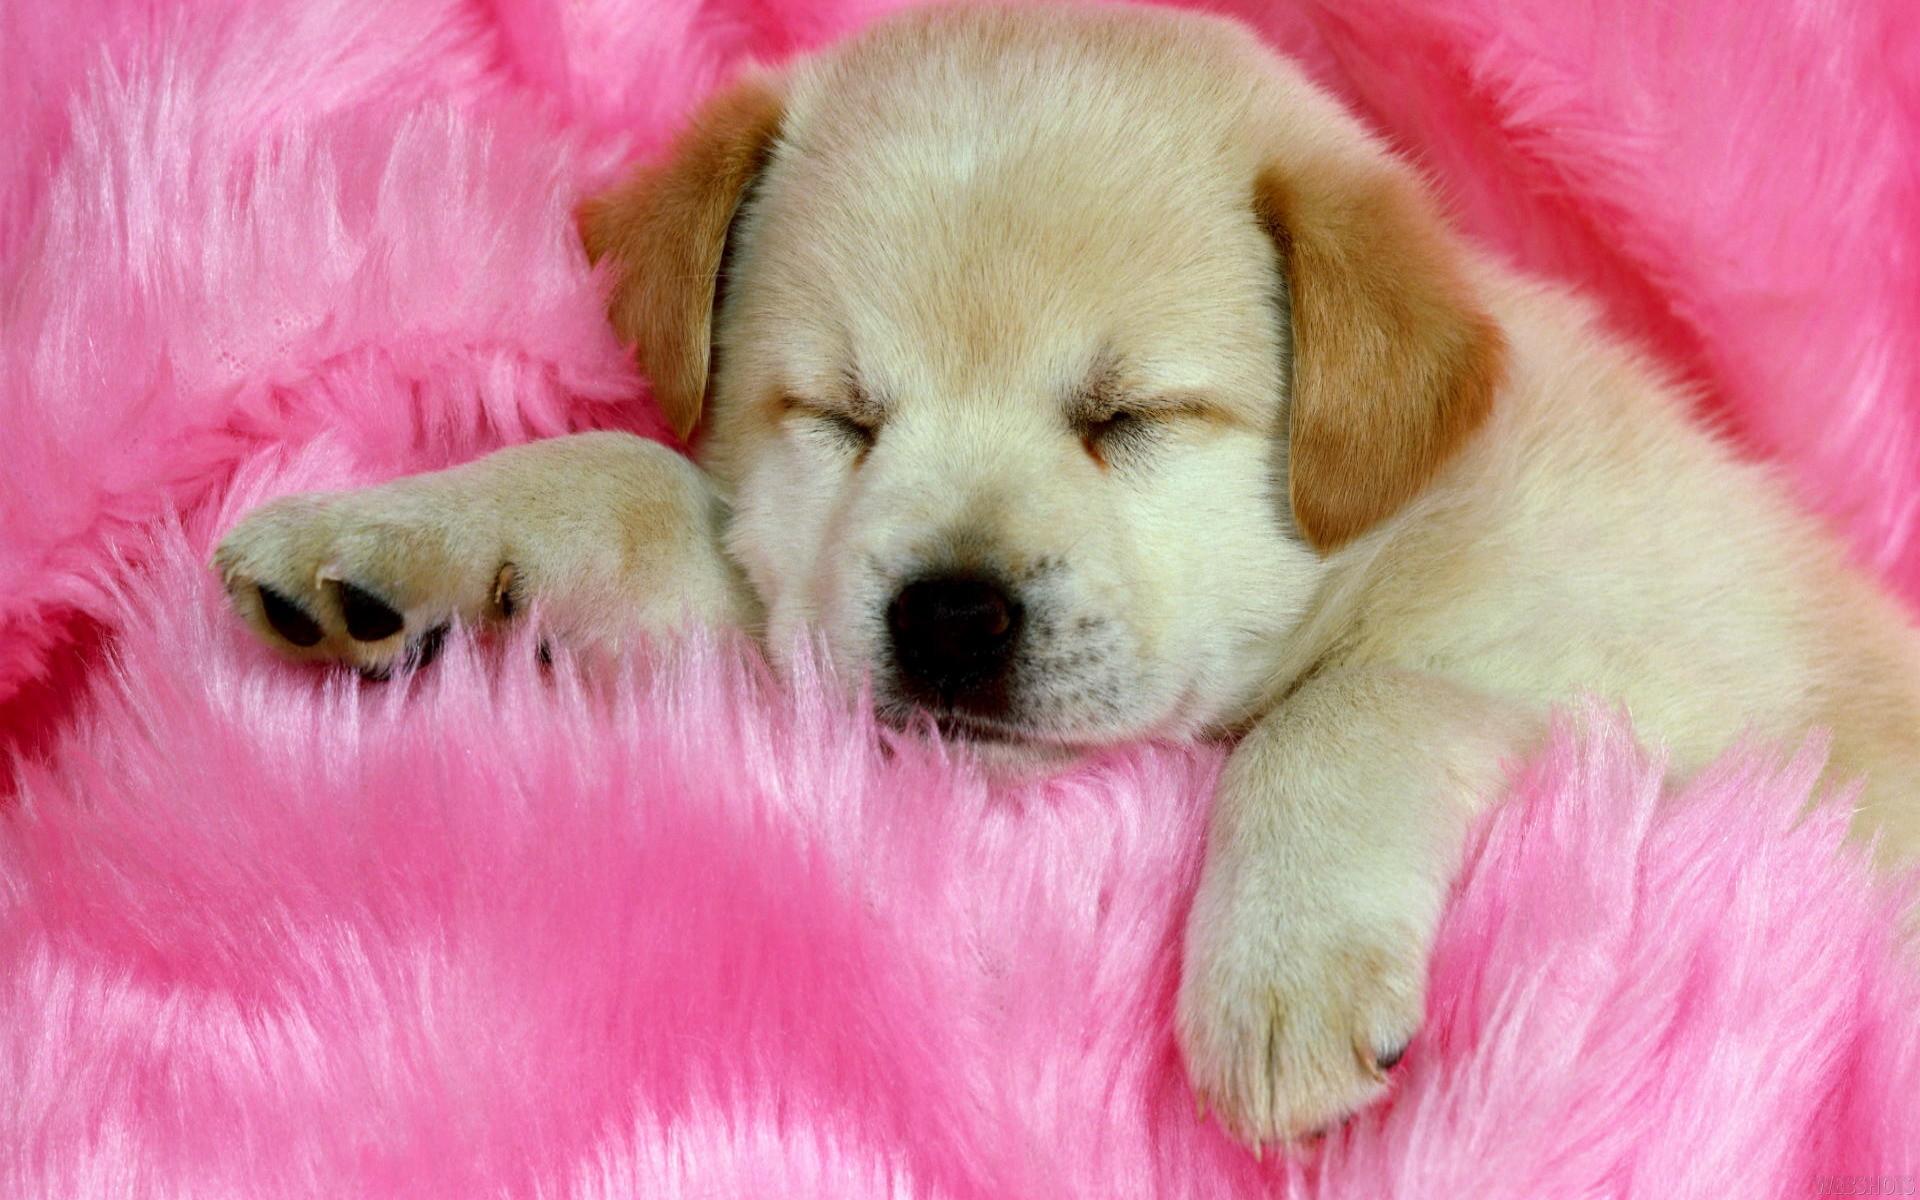 Cute Happy Valentine's Day Cat. Cute Animal Free Wallpaper: Funny Cute Dog  Sleep Hd Free Wallpaper Source 1920x1200px